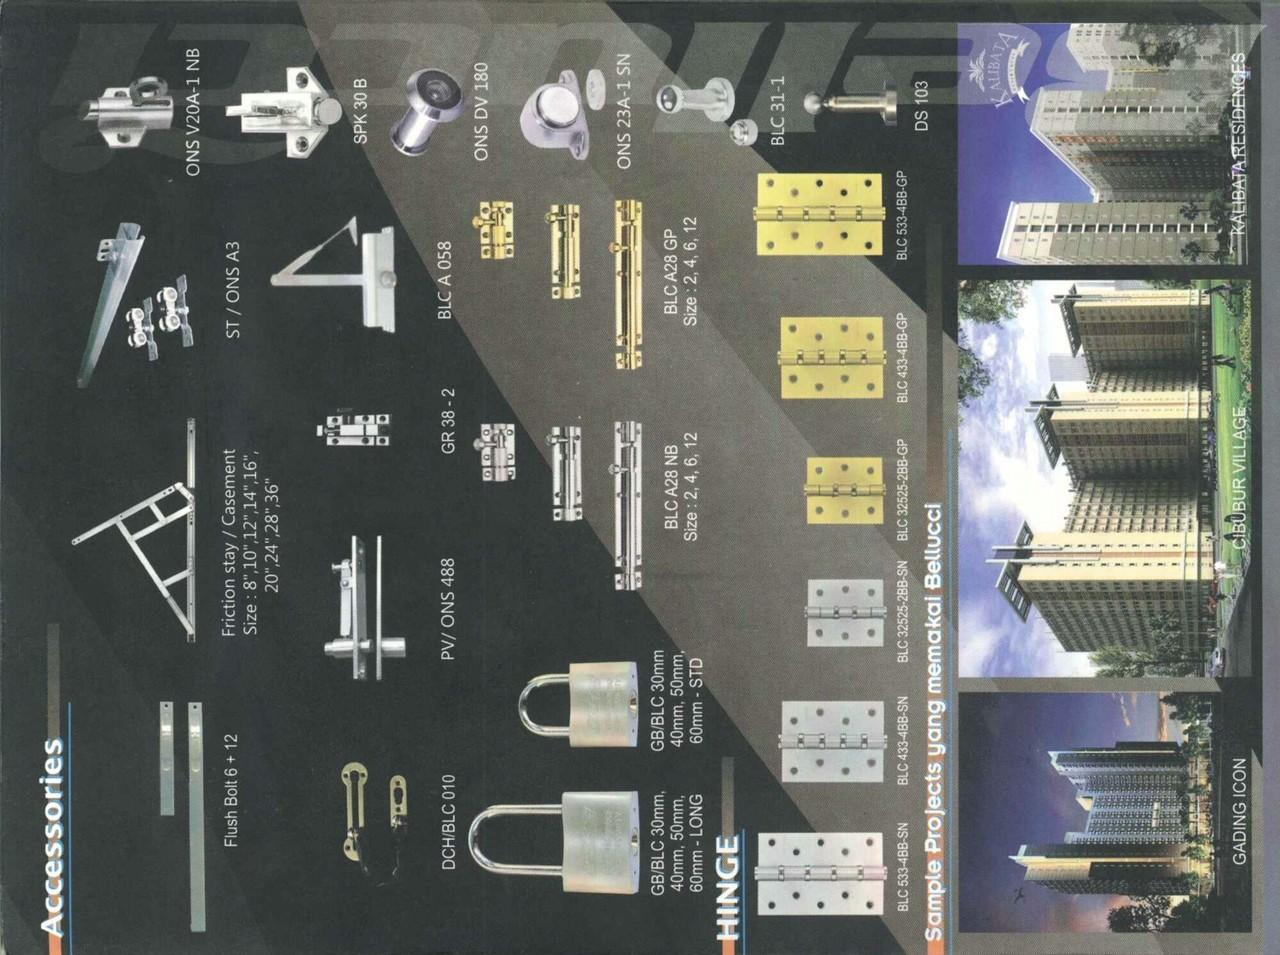 Kerjasama Distribusi Bahan Bangunan & Peralatan Elektrikal